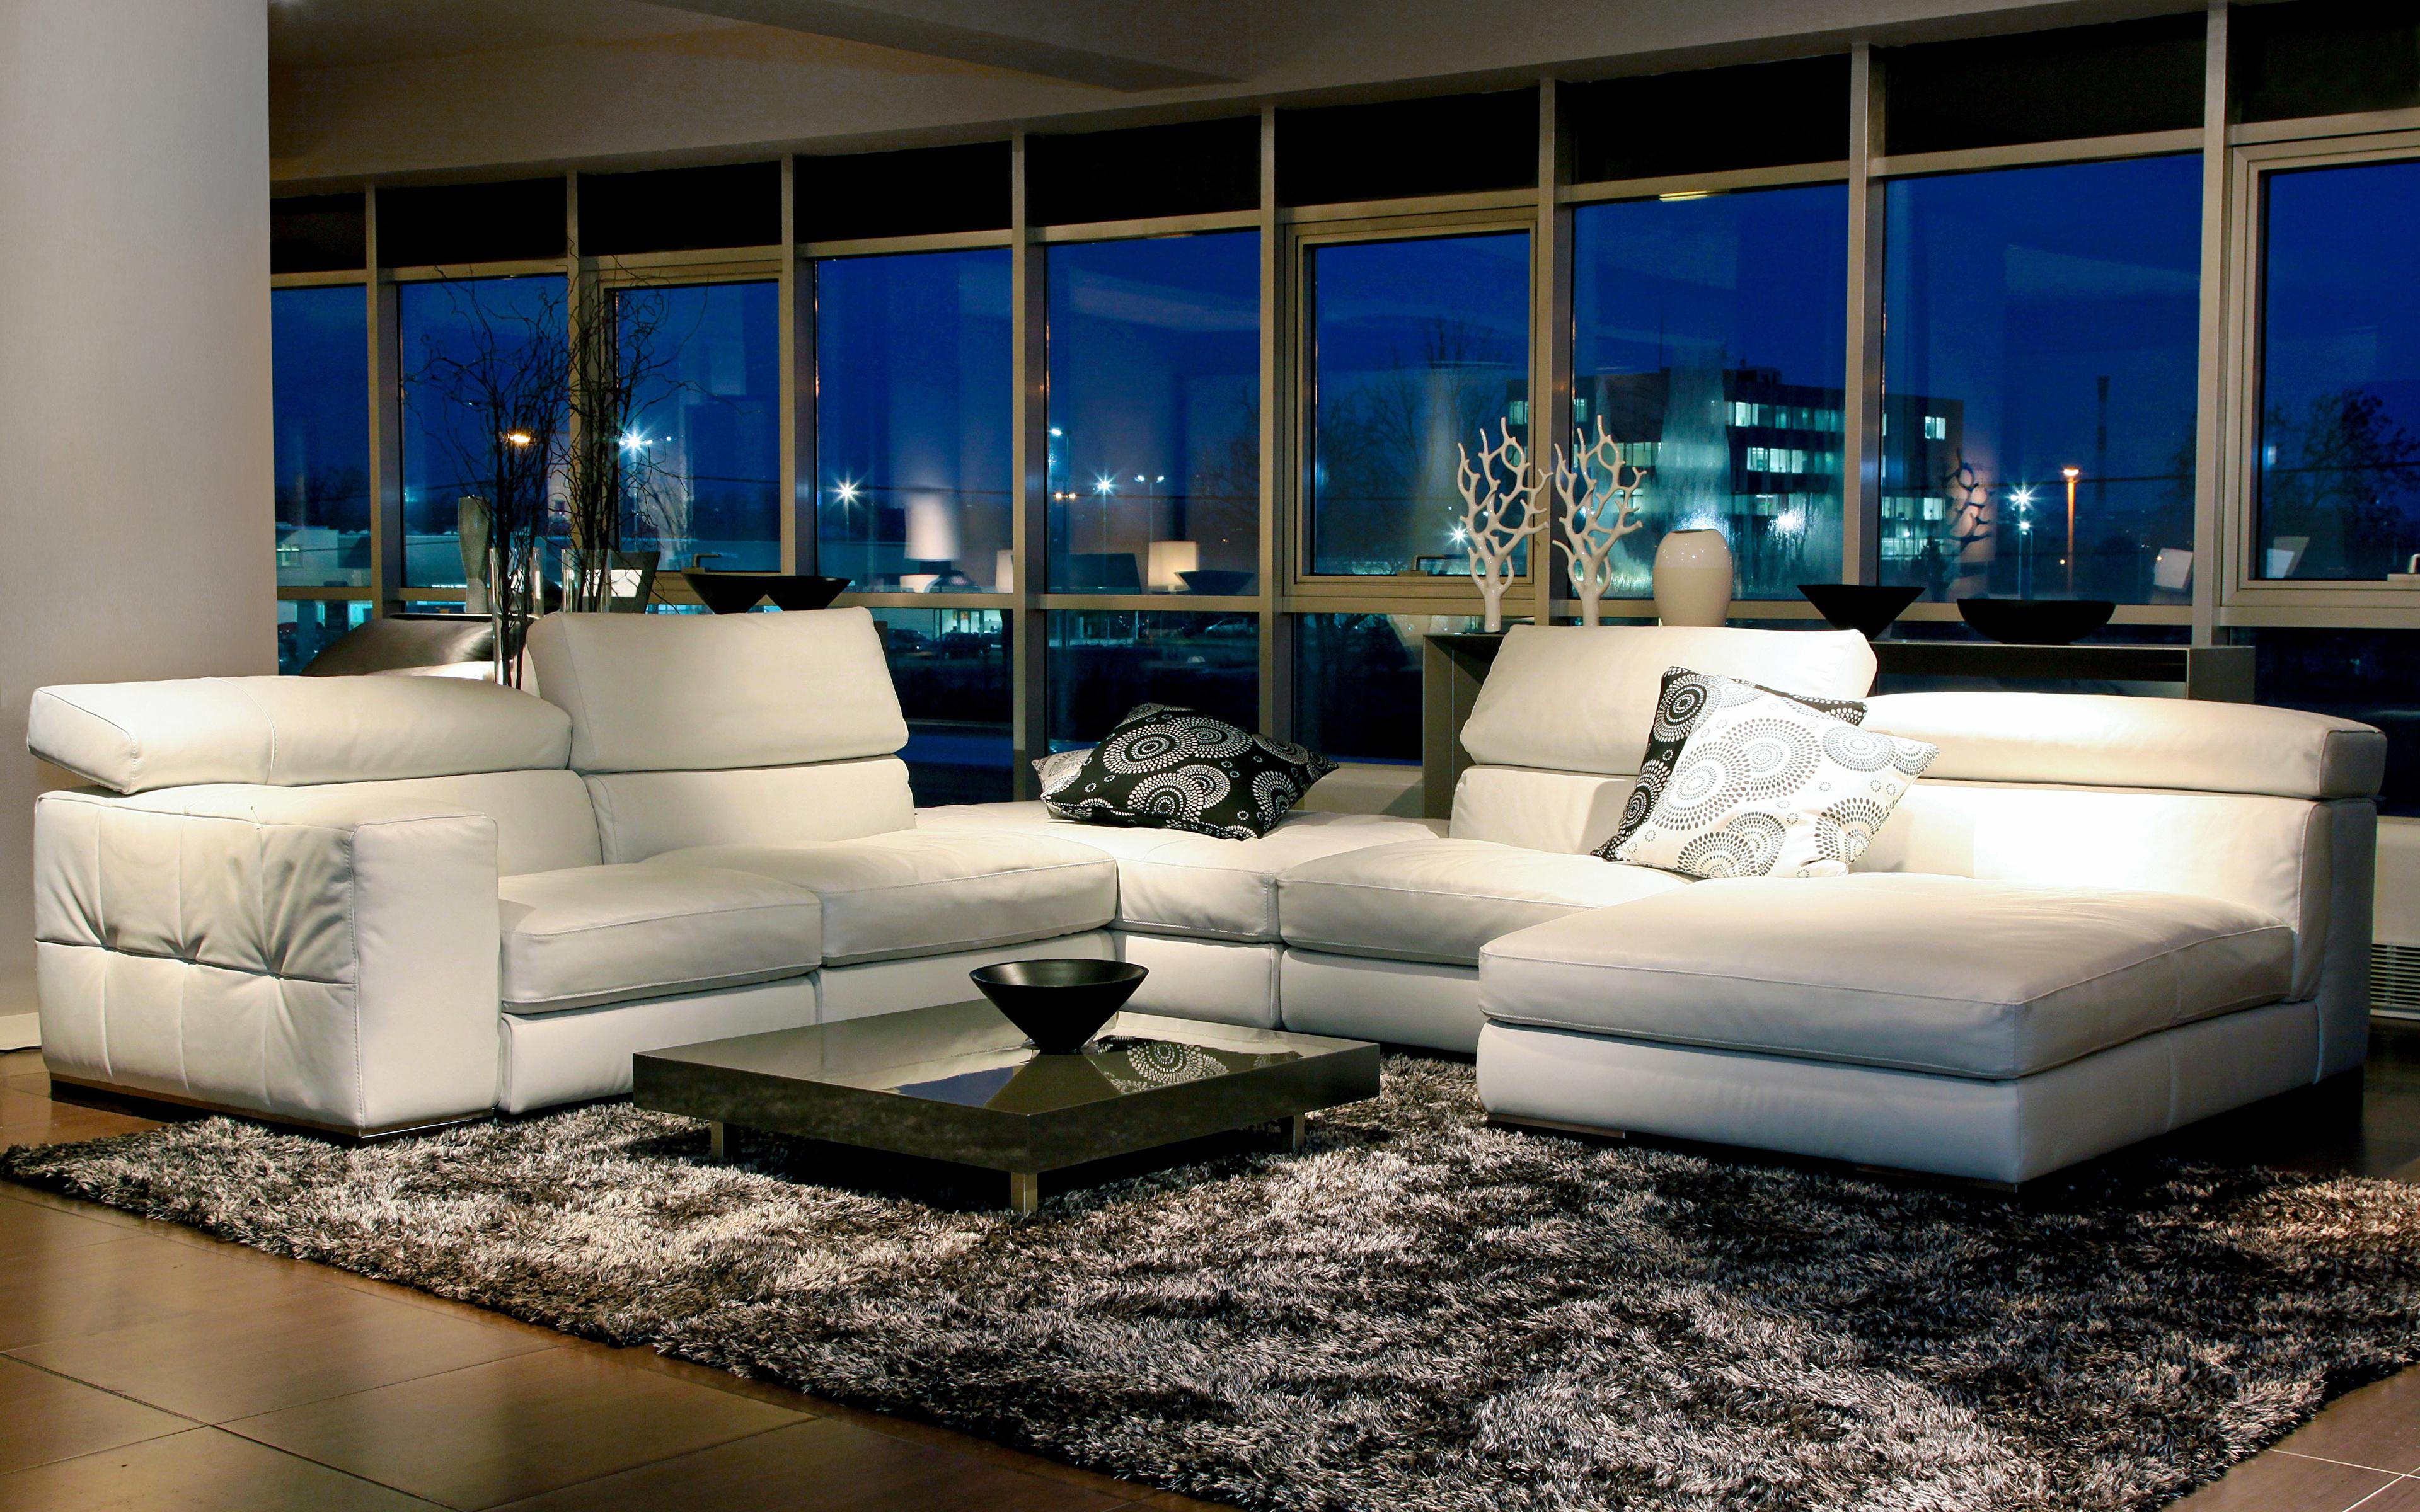 интерьер комната окна диван interior bathroom Windows sofa  № 3530253 загрузить